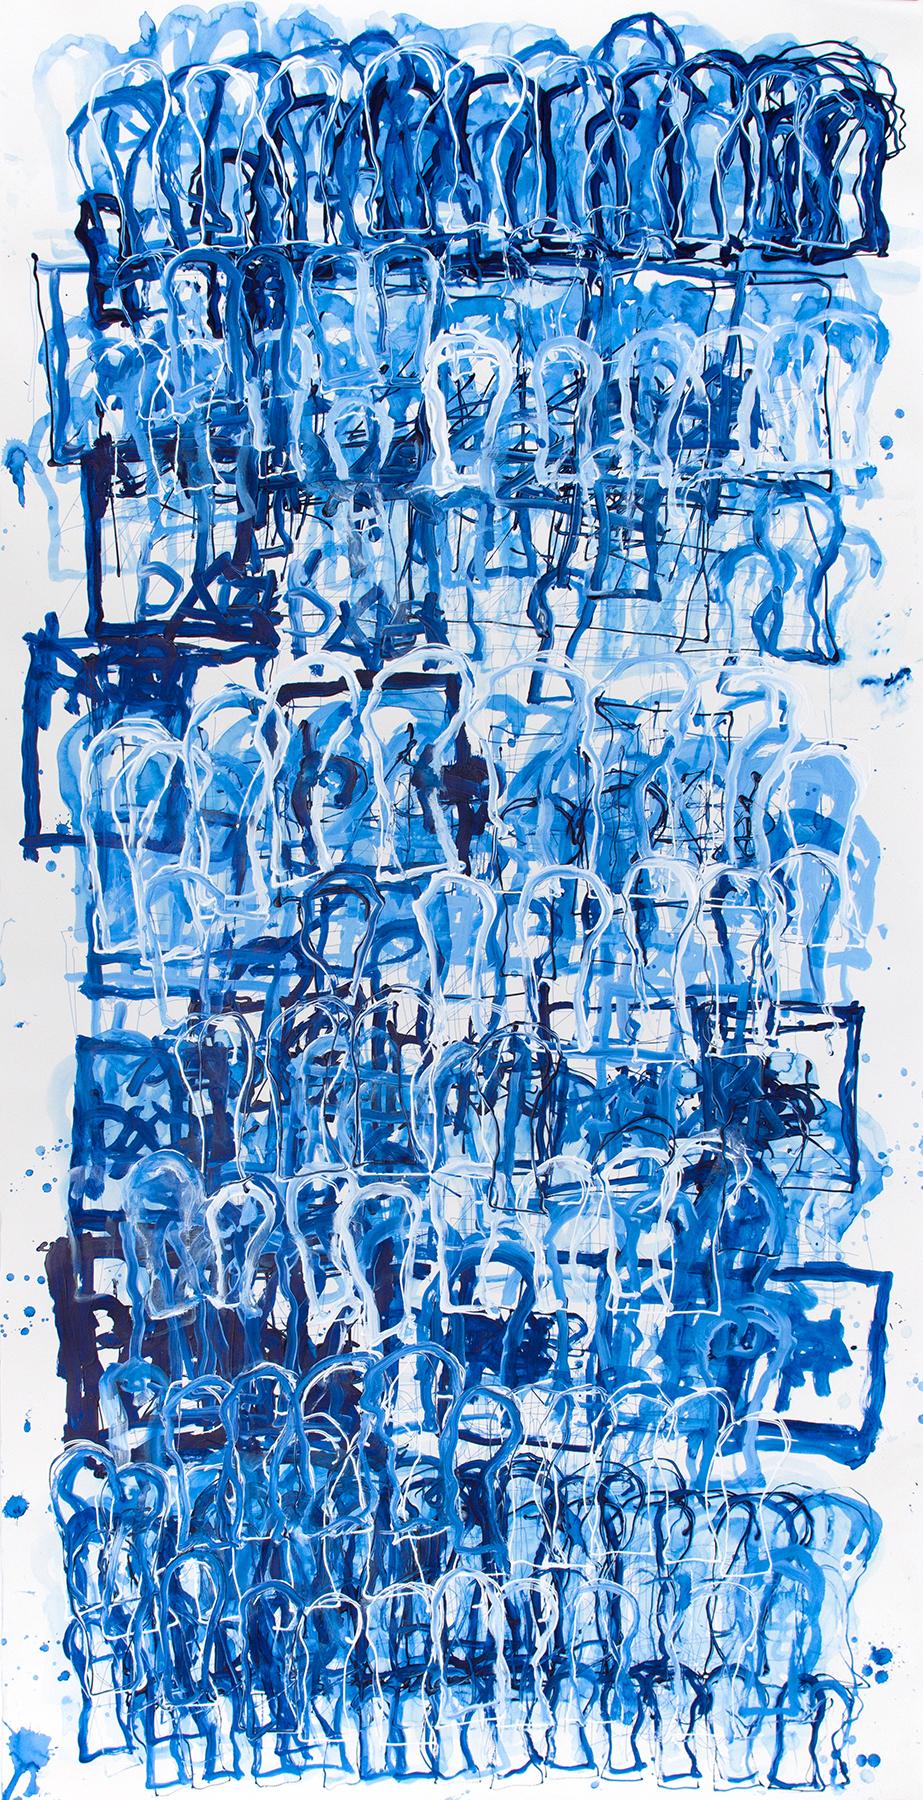 Dan Miller, Untitled (DM 1145), 2018, 56.5 x 108.5 inches